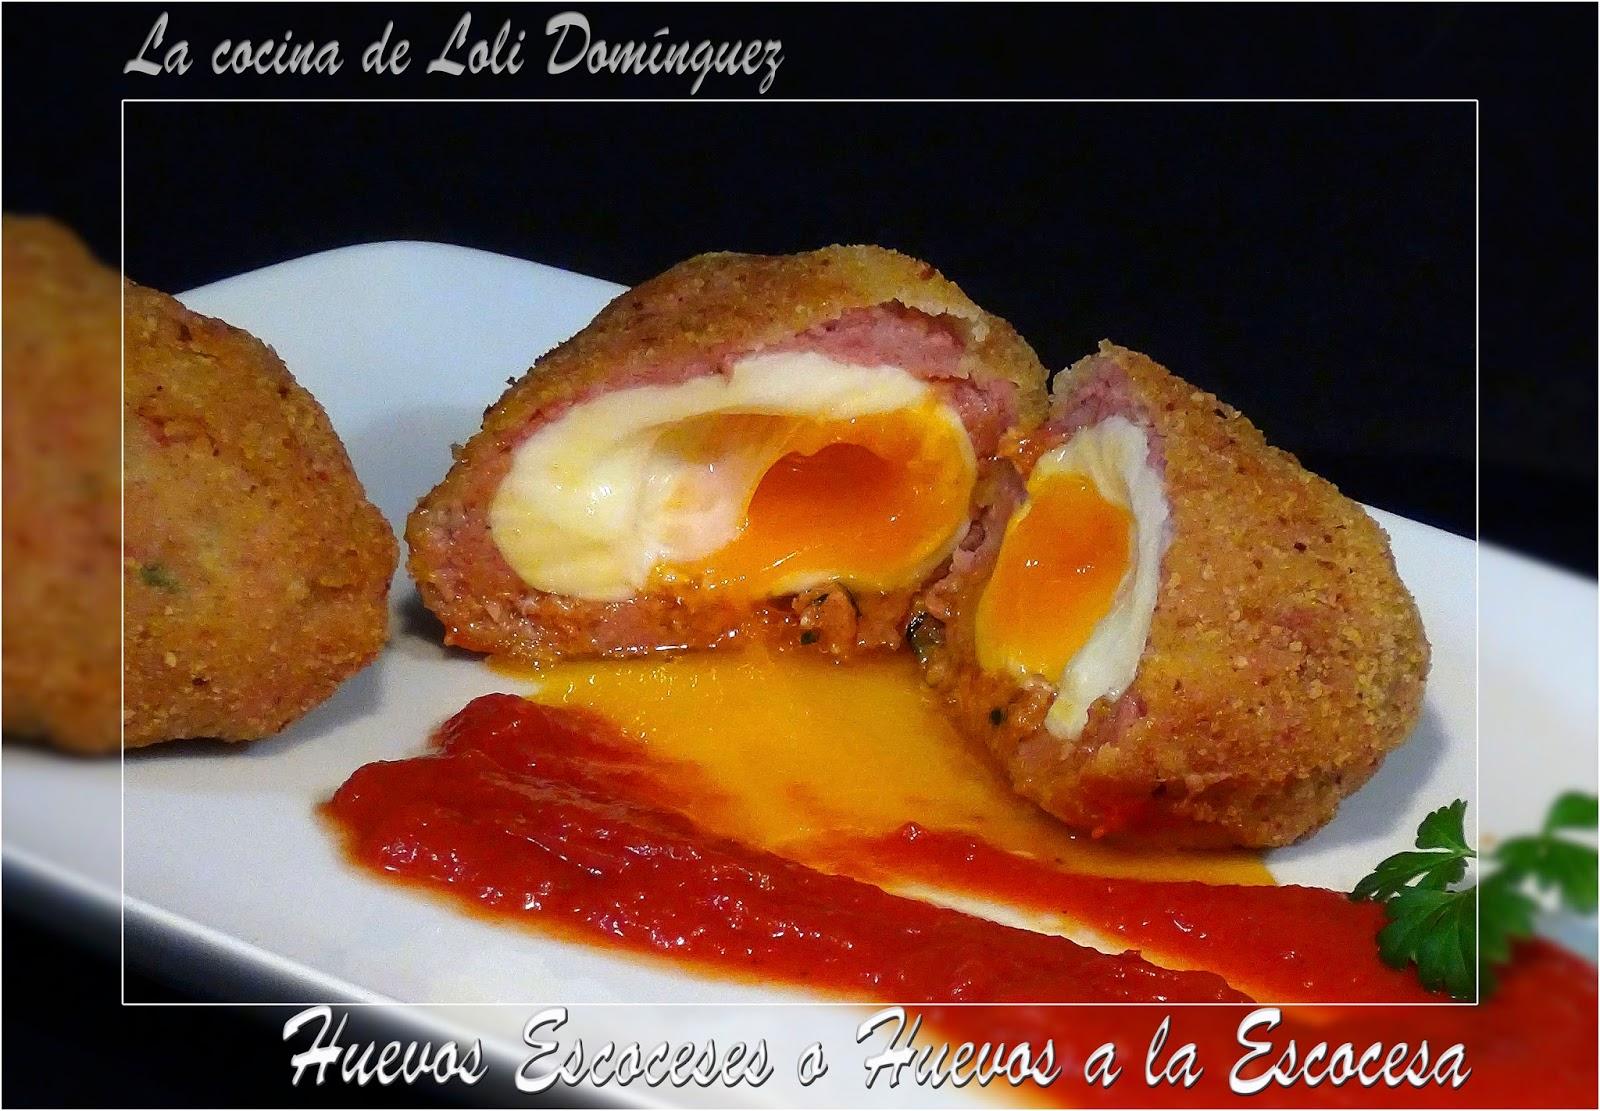 la cocina de loli dom nguez huevos escoceses o huevos a